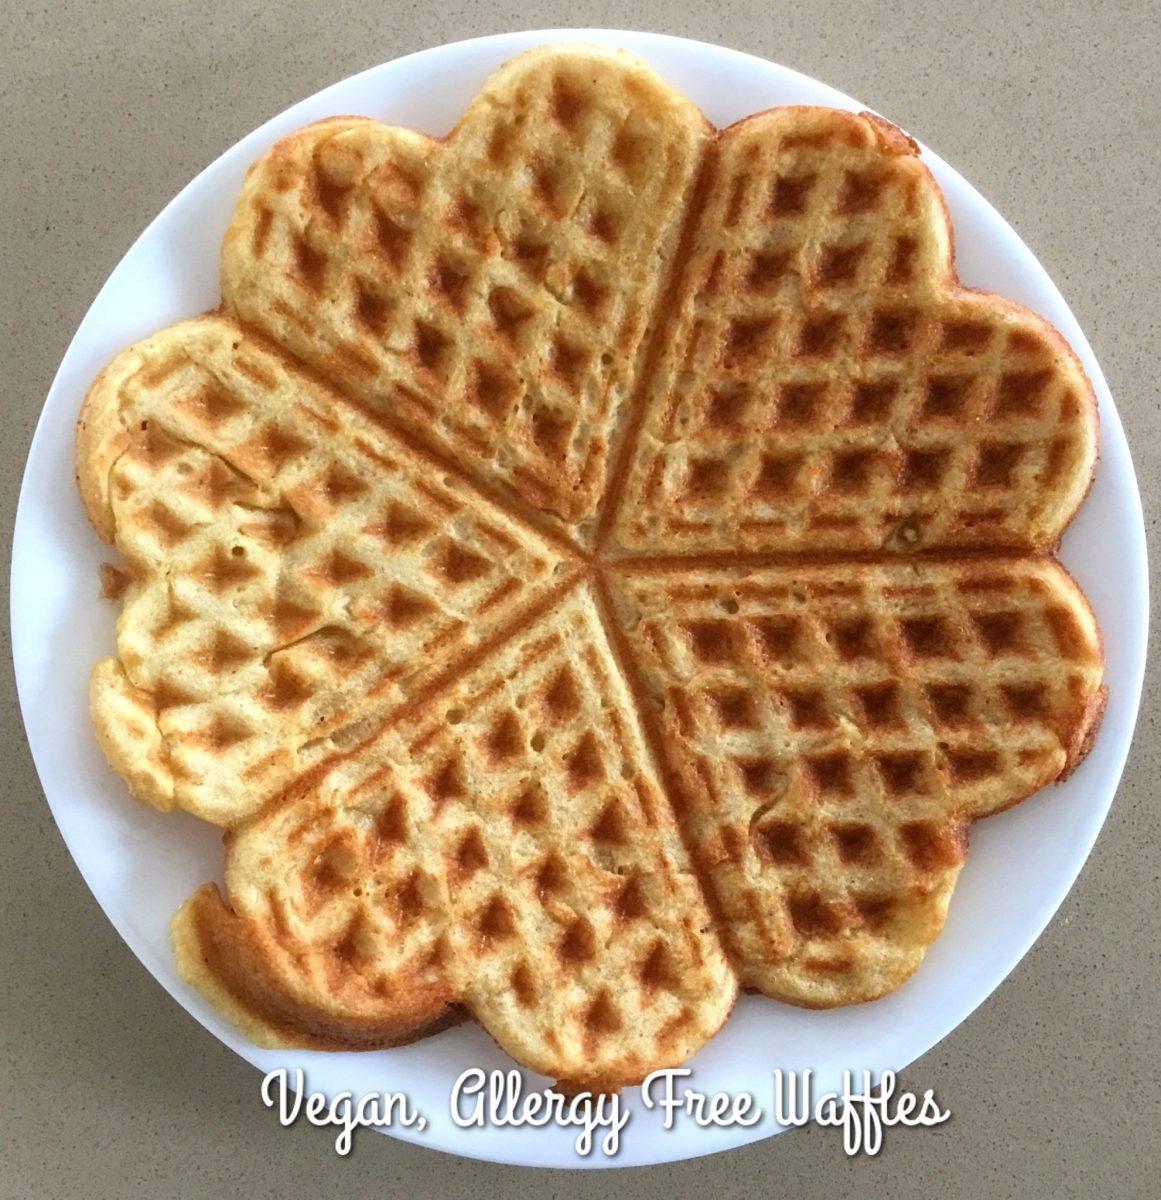 Vegan Gluten-free & Sugar-free Waffles